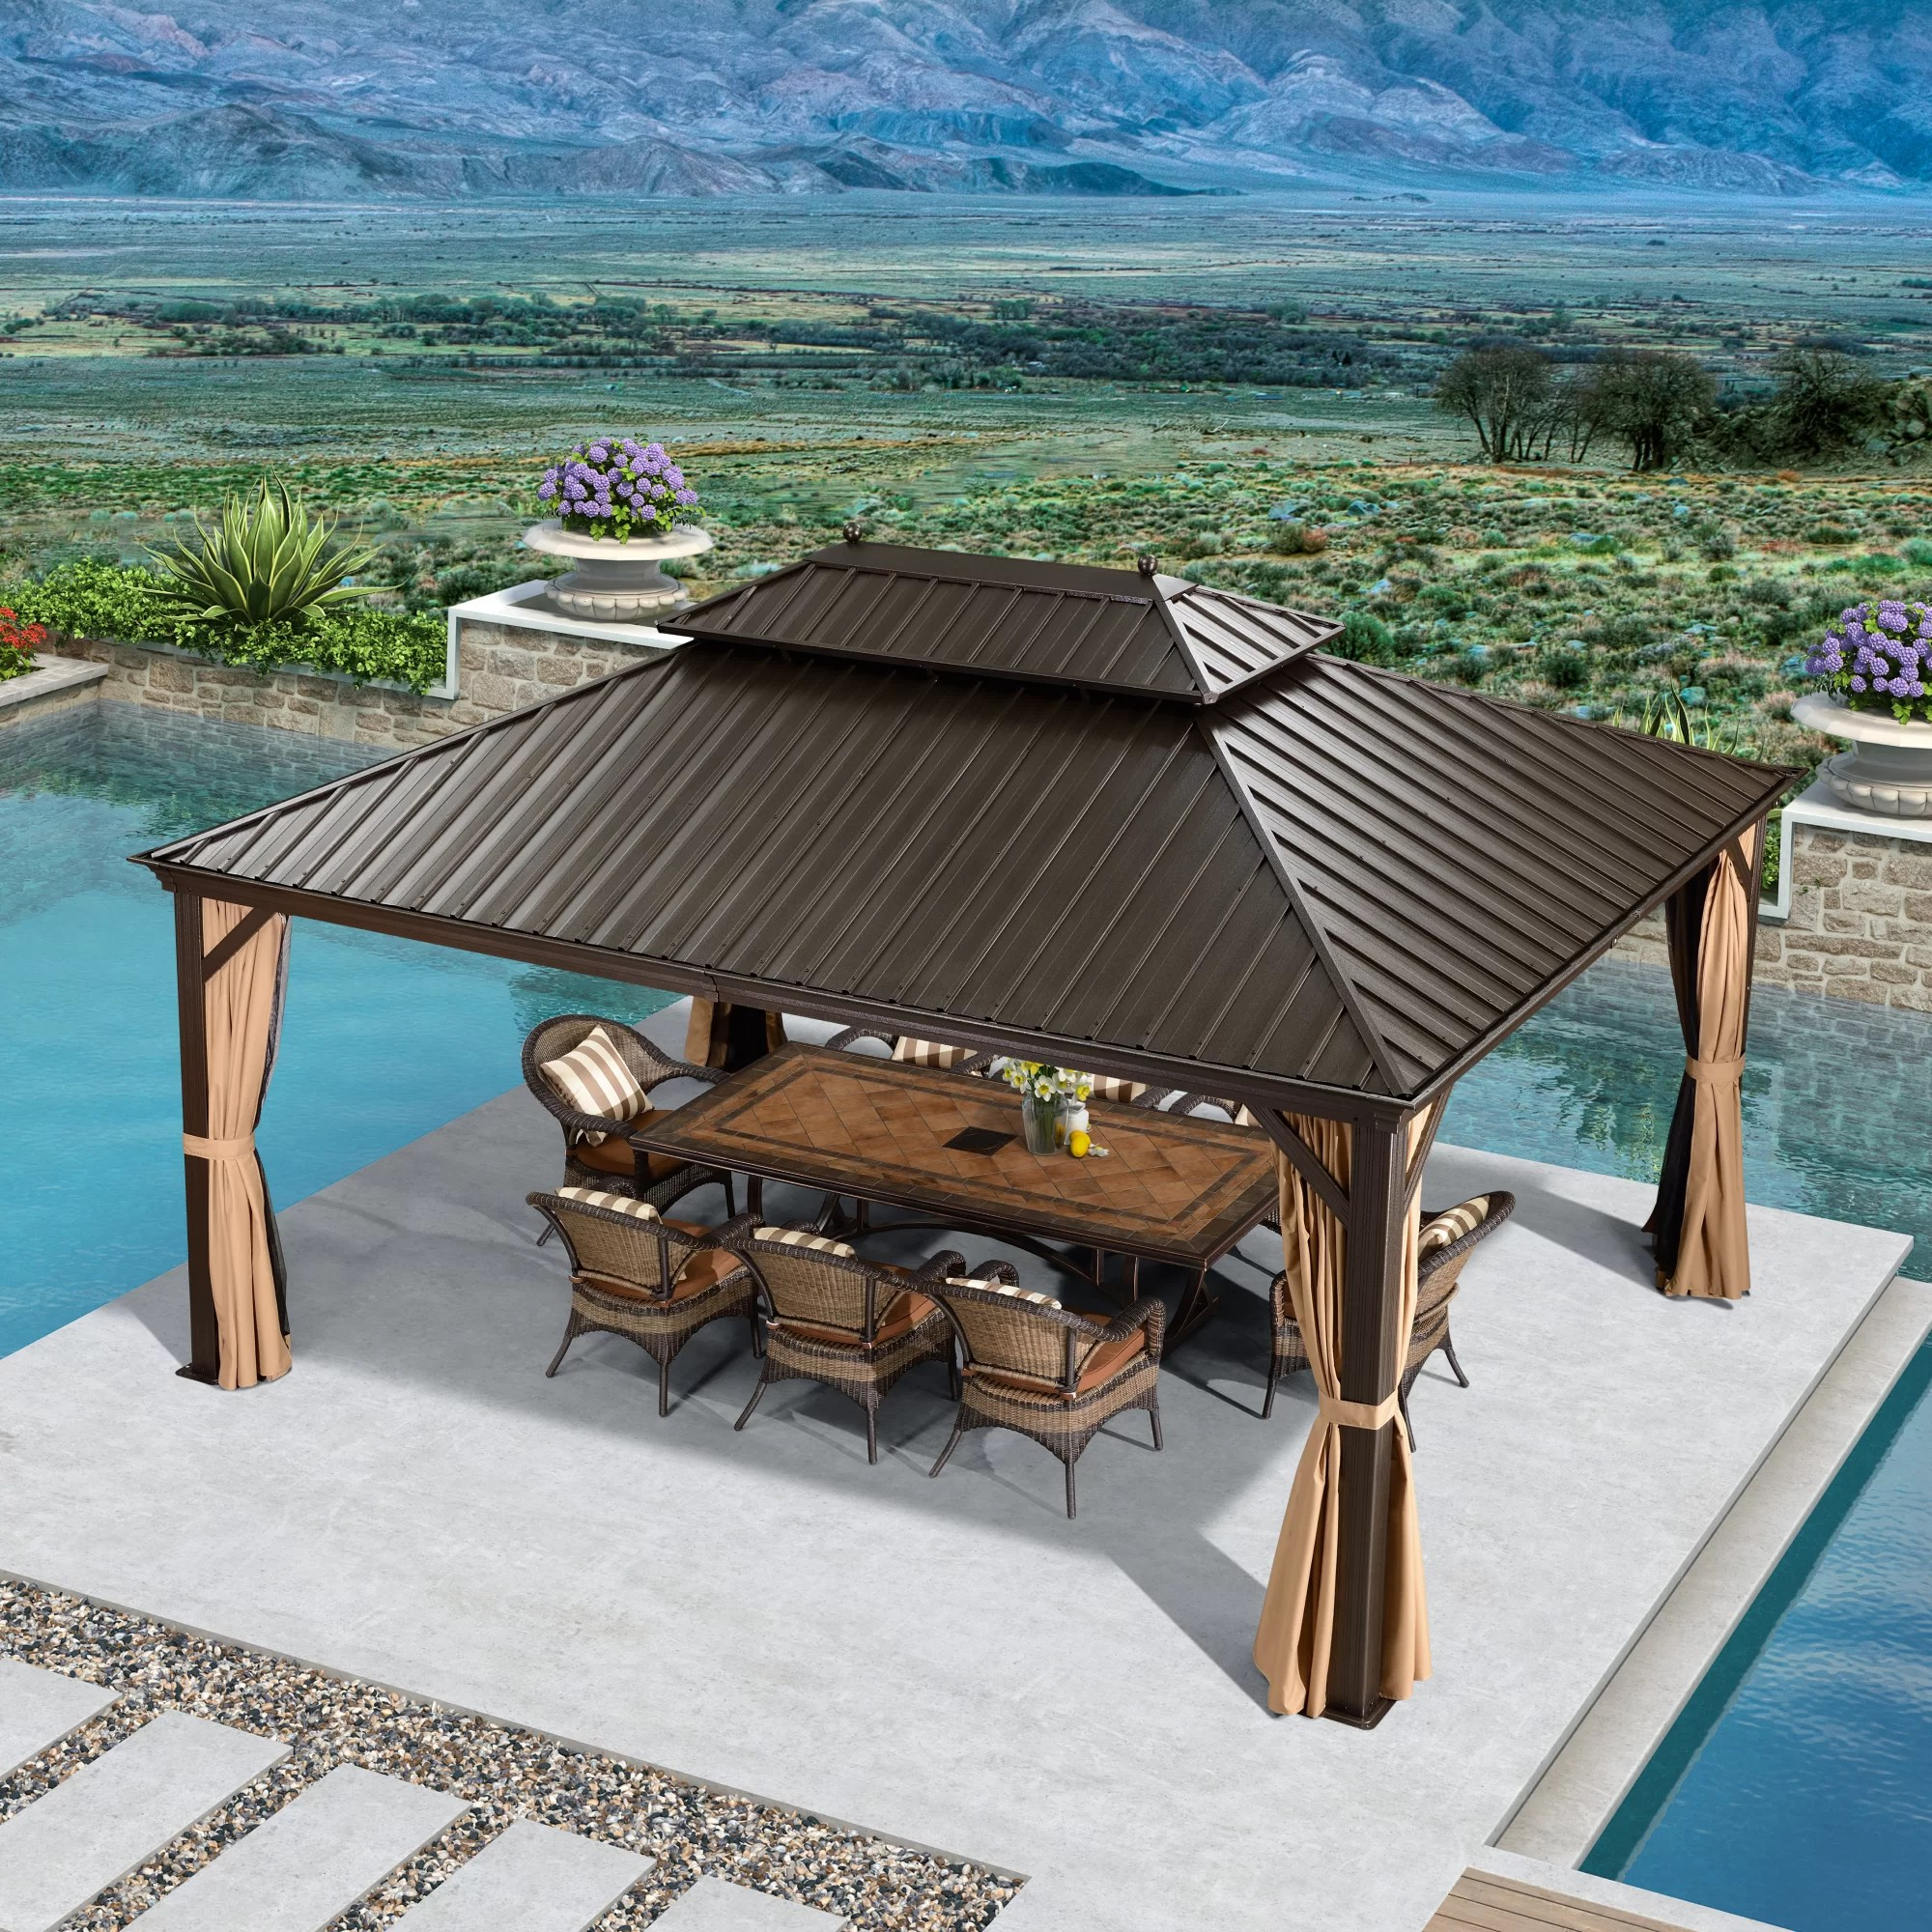 16 ft w x 12 ft d aluminum patio gazebo